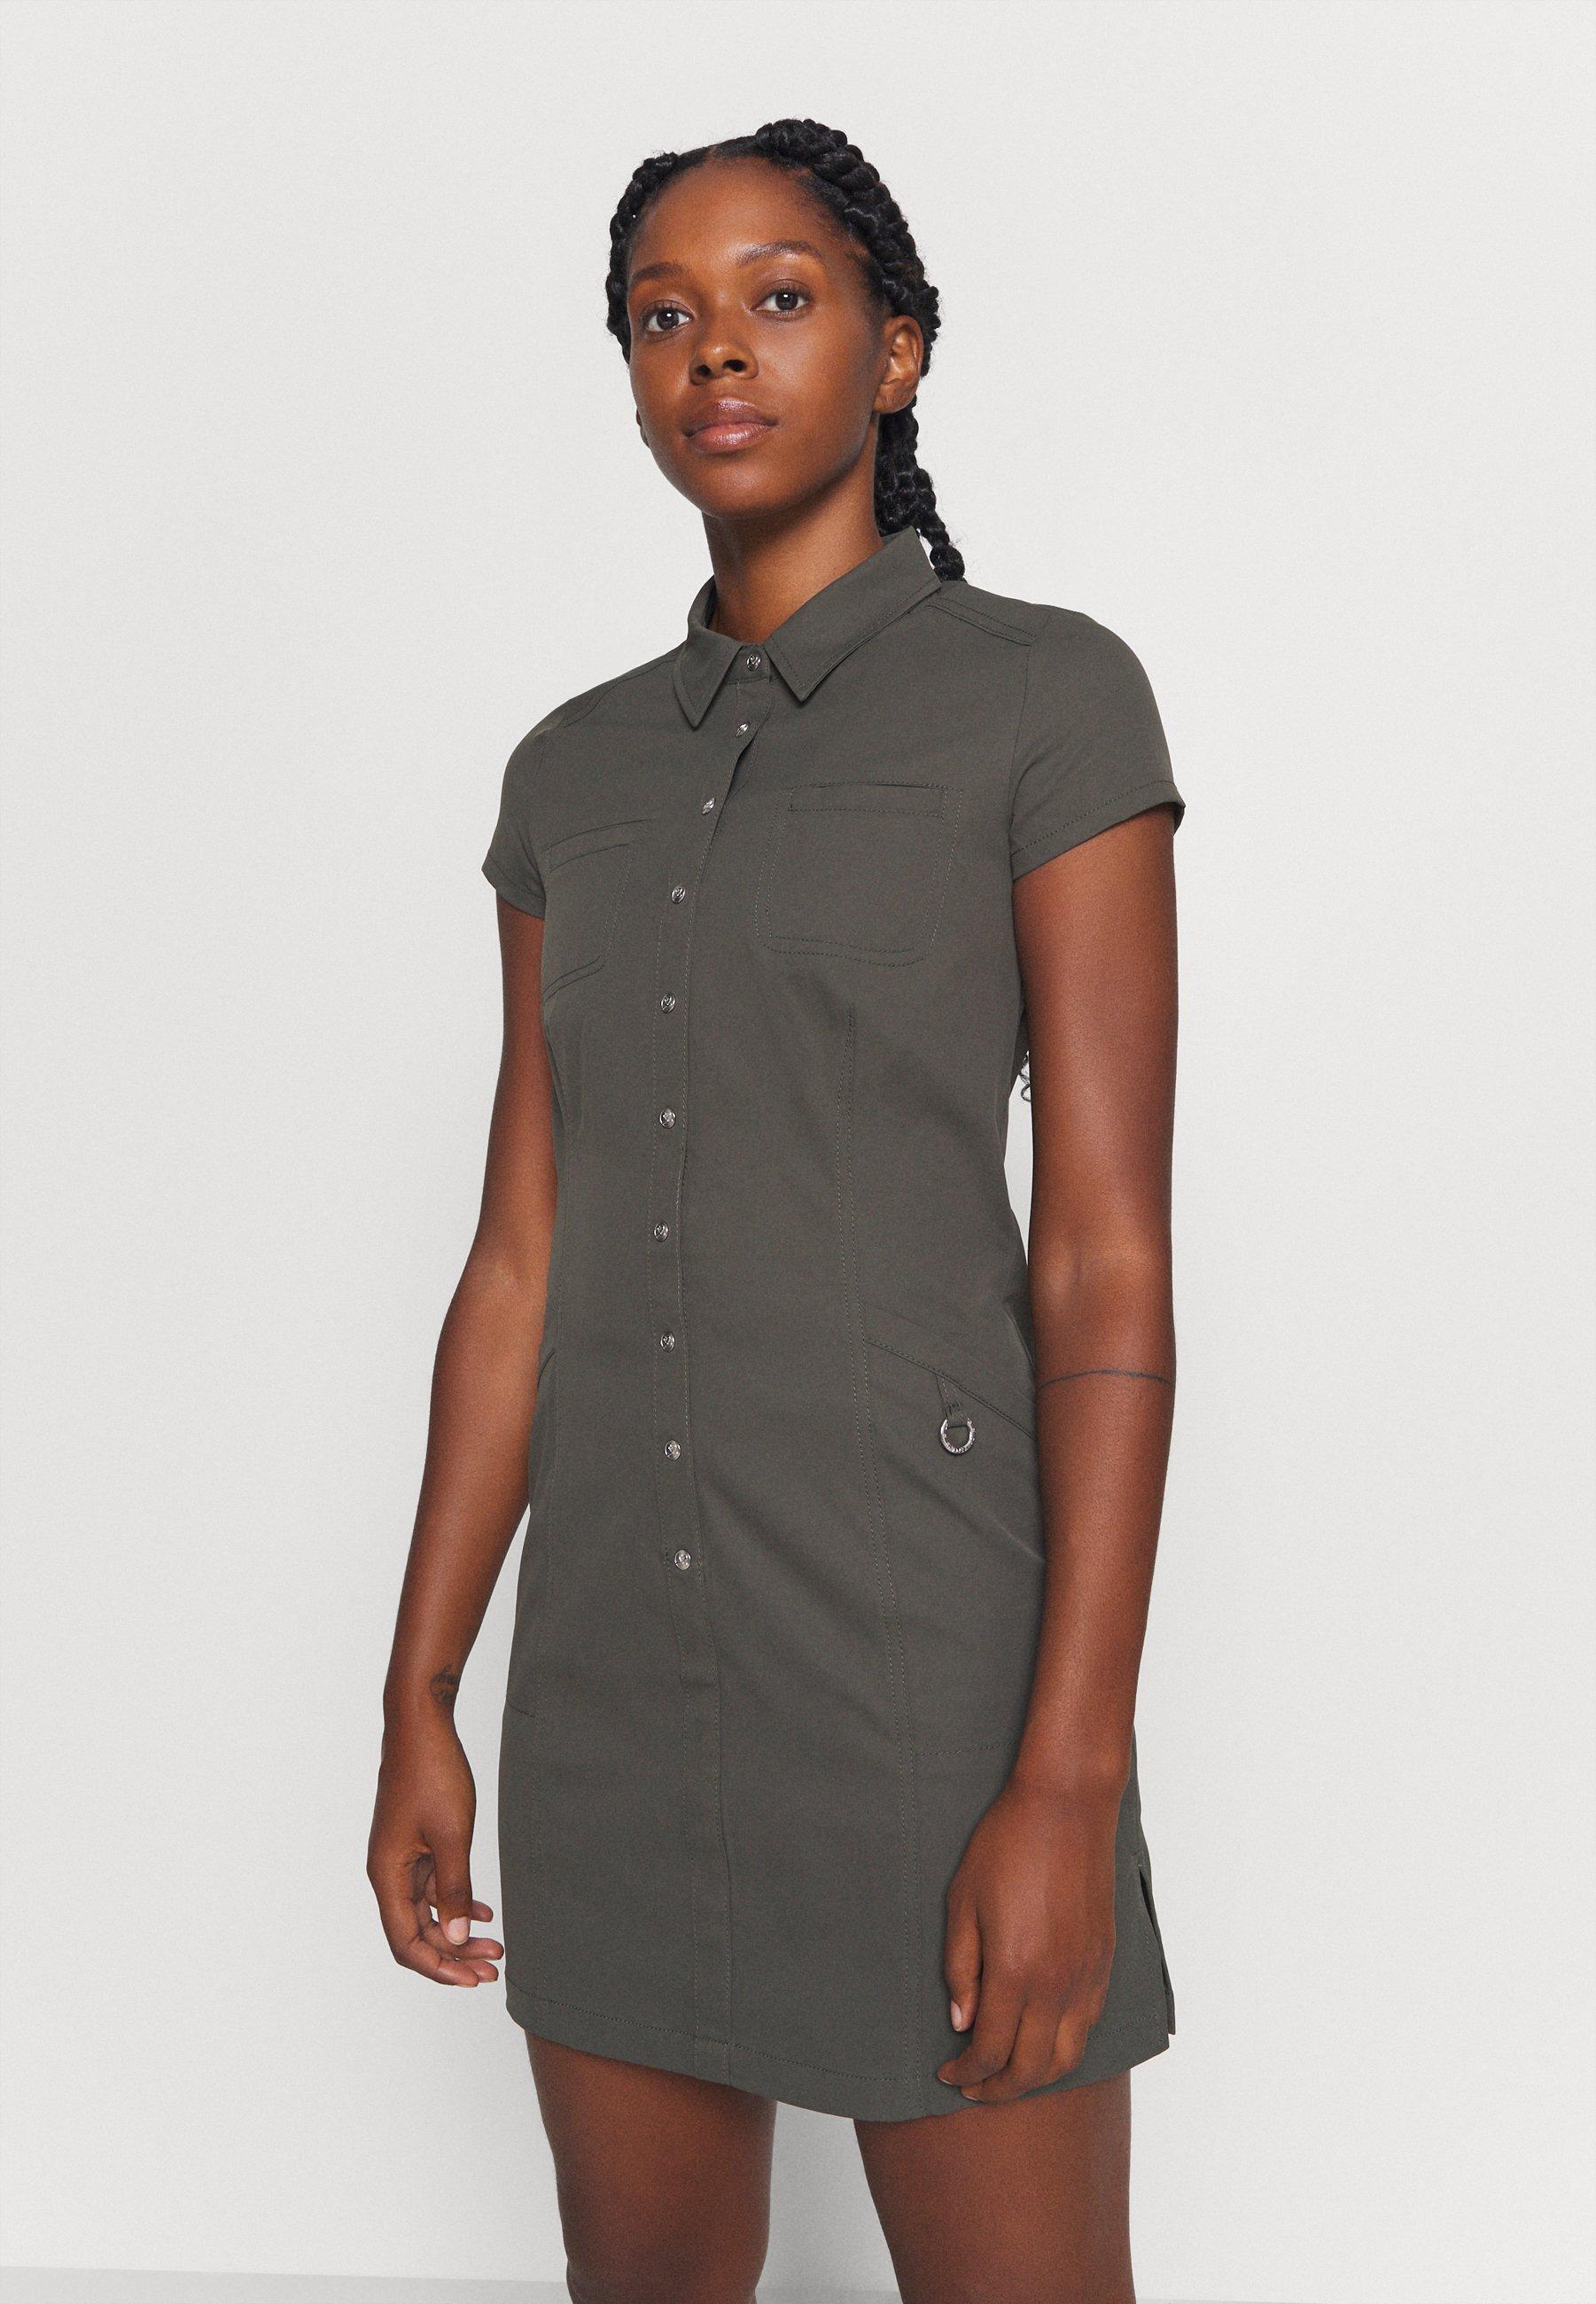 Big Sale Women's Clothing Daily Sports LYRIC CAP DRESS Sports dress cypress LtsLXgjyb